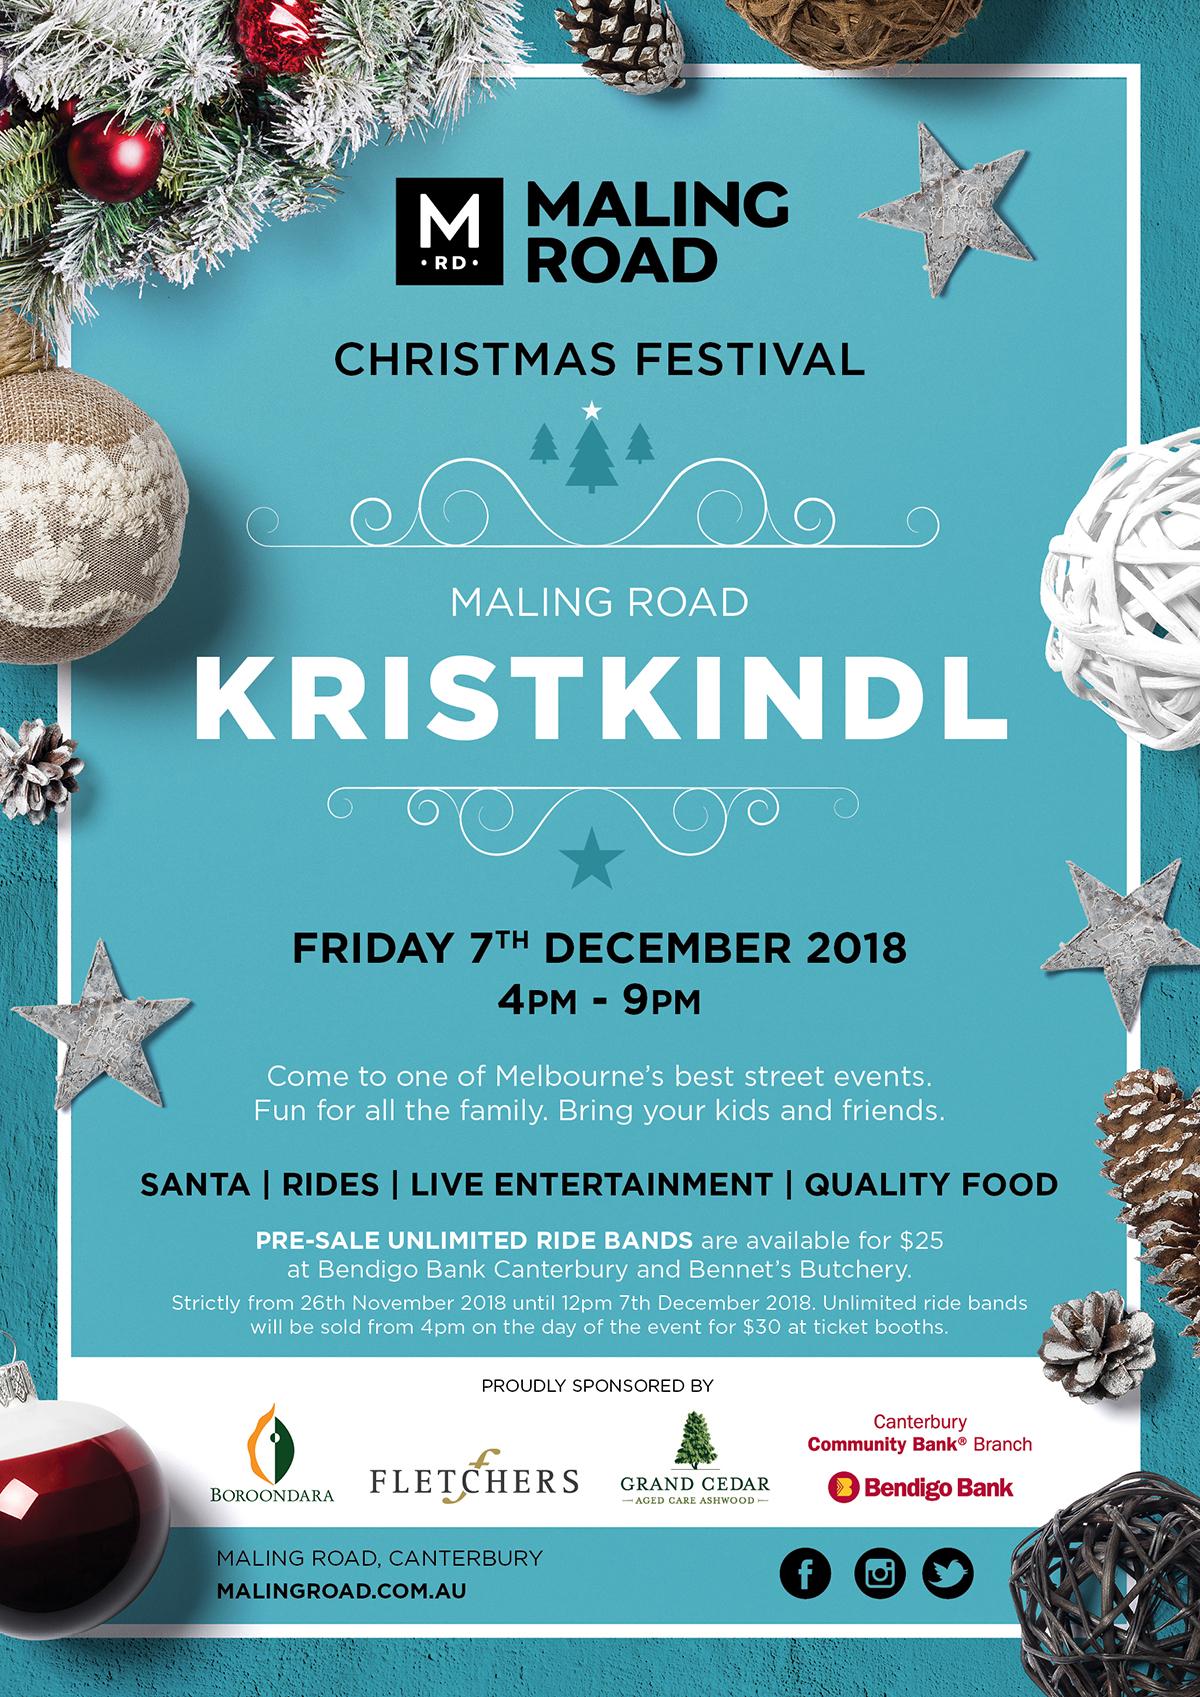 Maling Road Kristkindl Christmas Festival